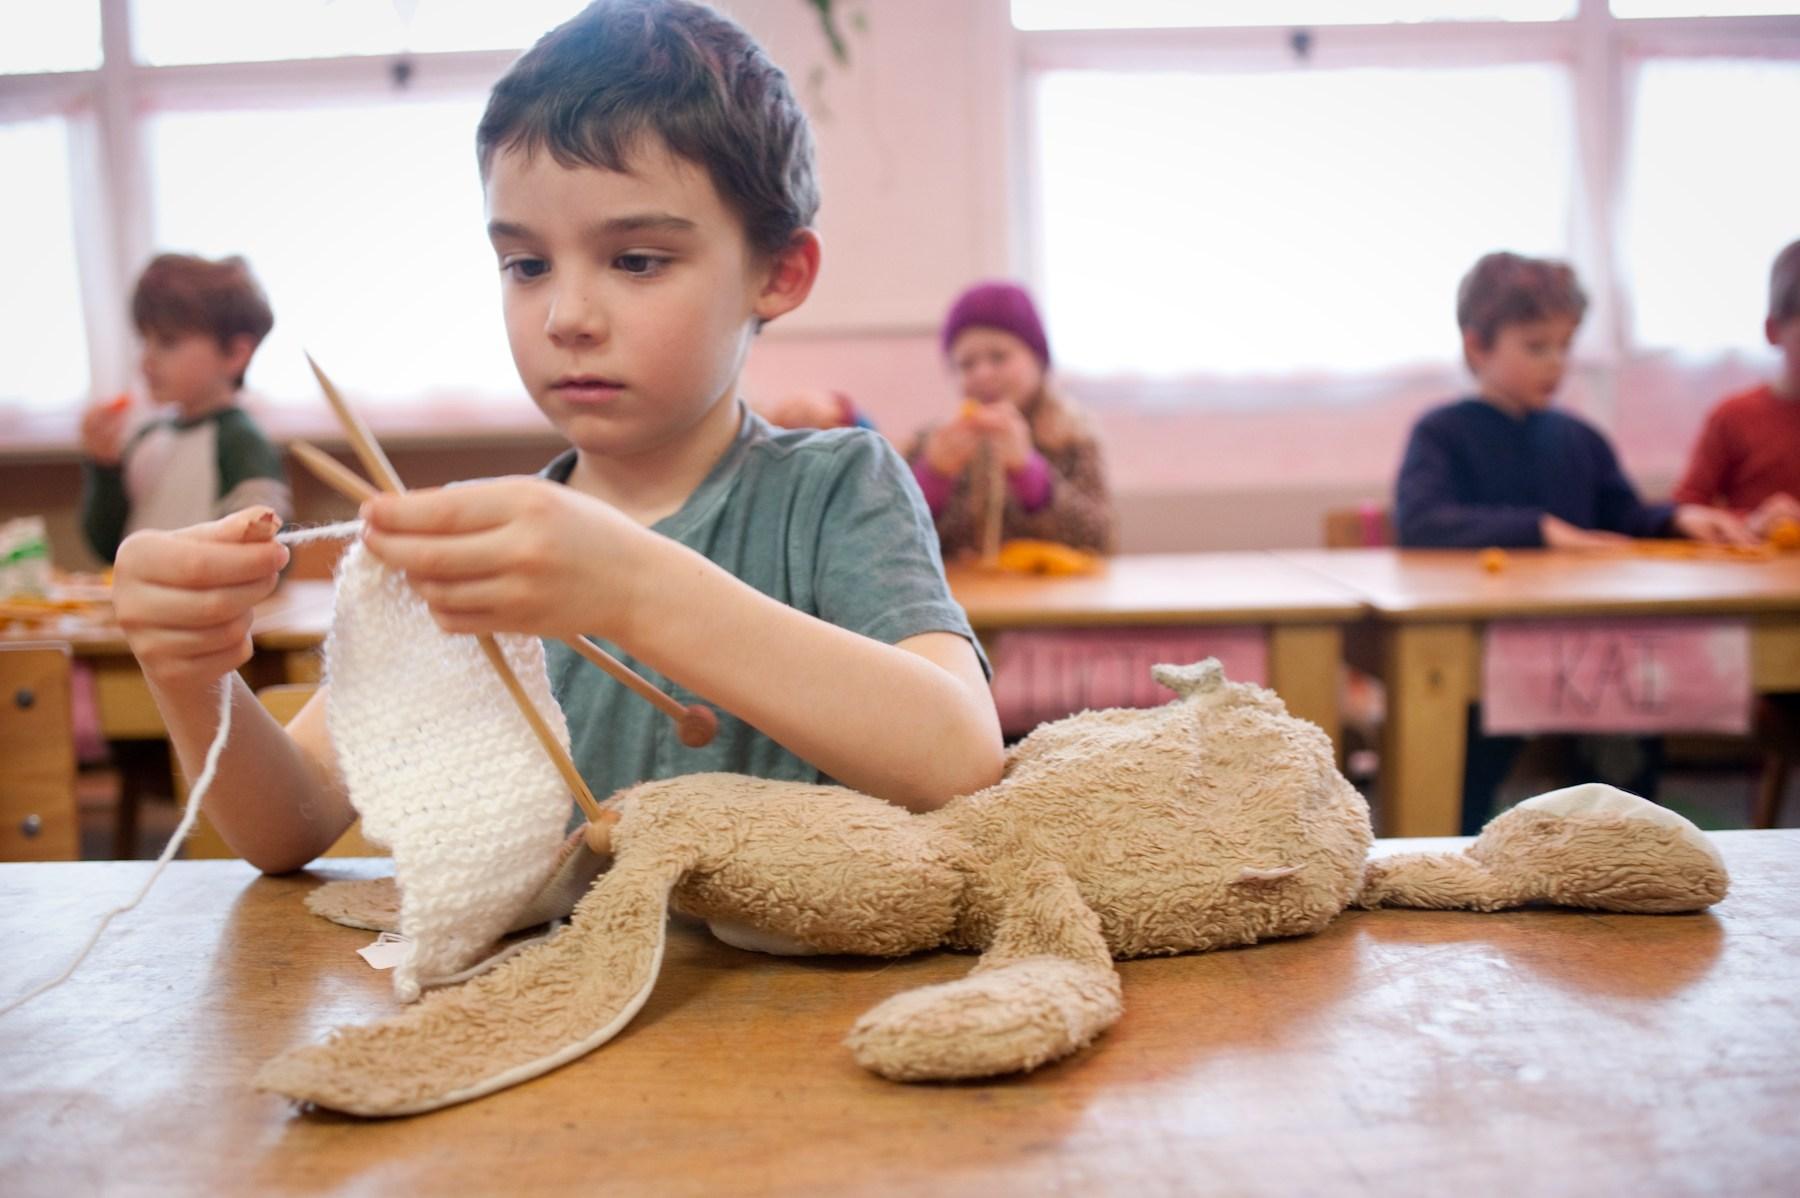 Liam S knitting